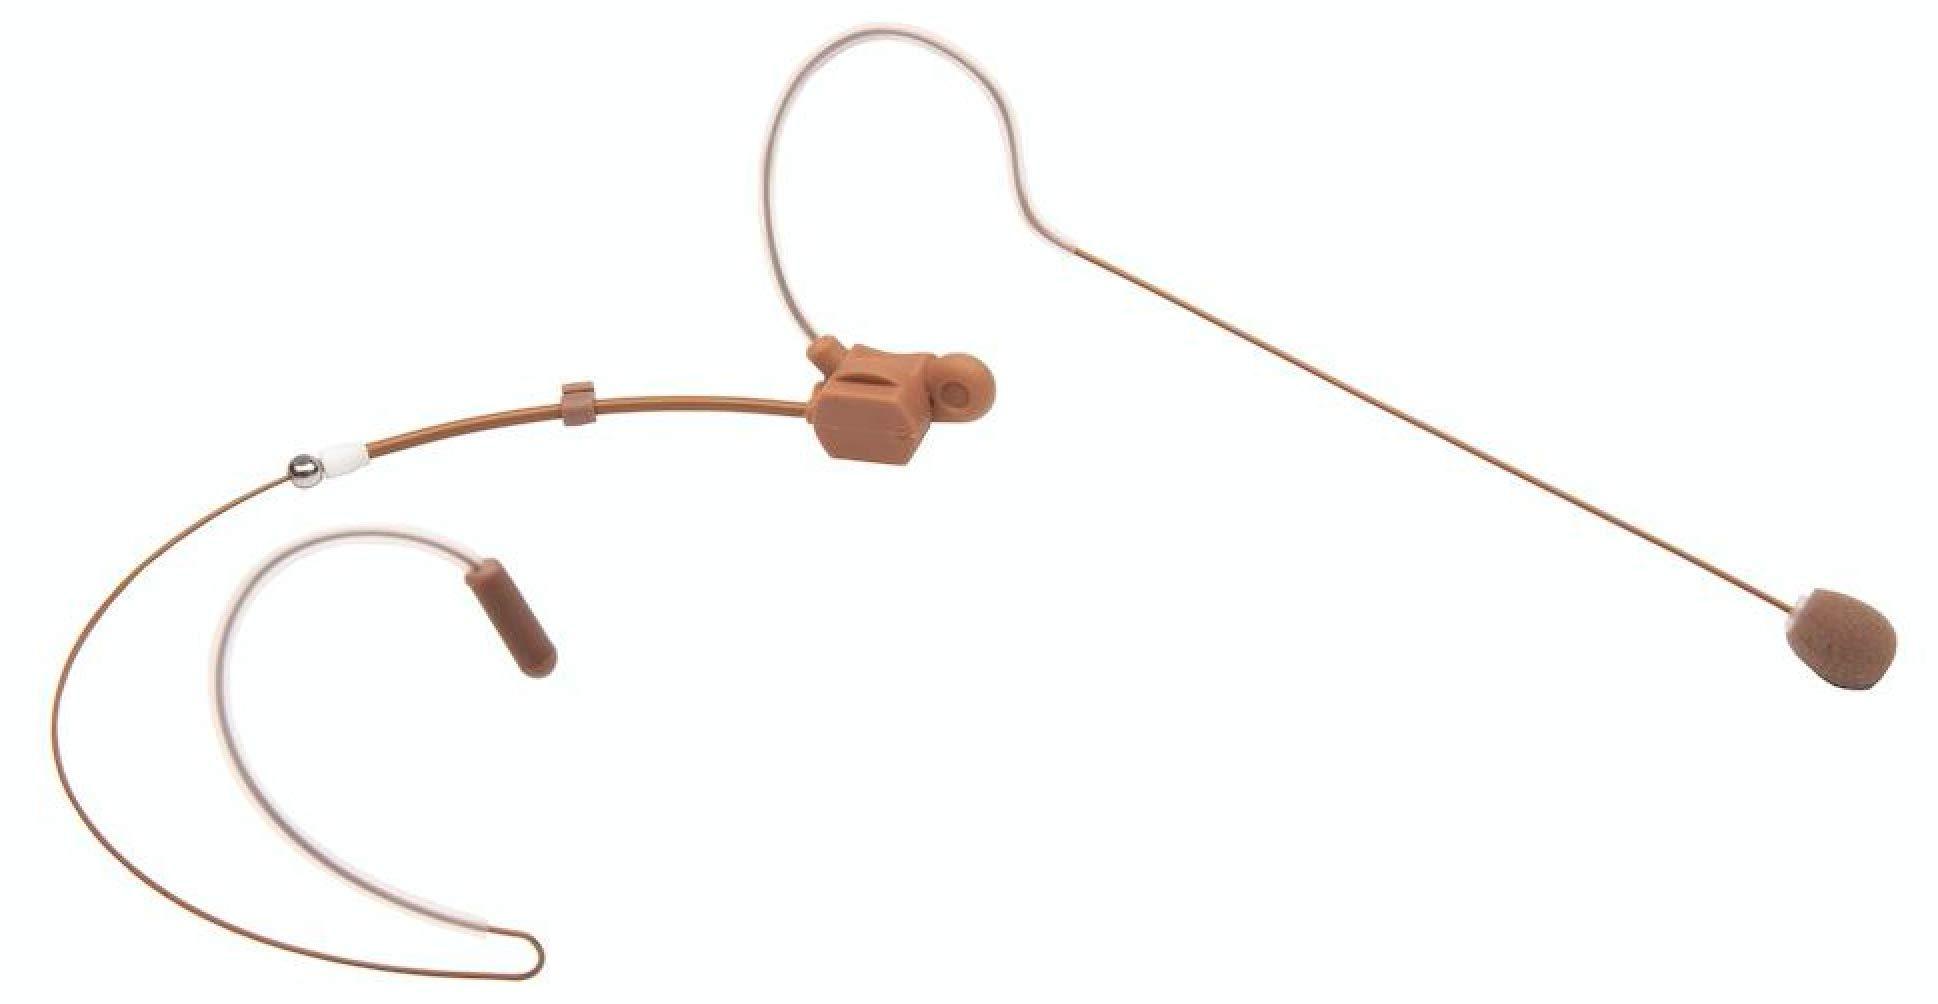 Thor Hammer SE-11 Single Ear Headset Microphone 3.5mm for Sennheiser Evolution HM-SEO11-T-3.5MM (Brown)